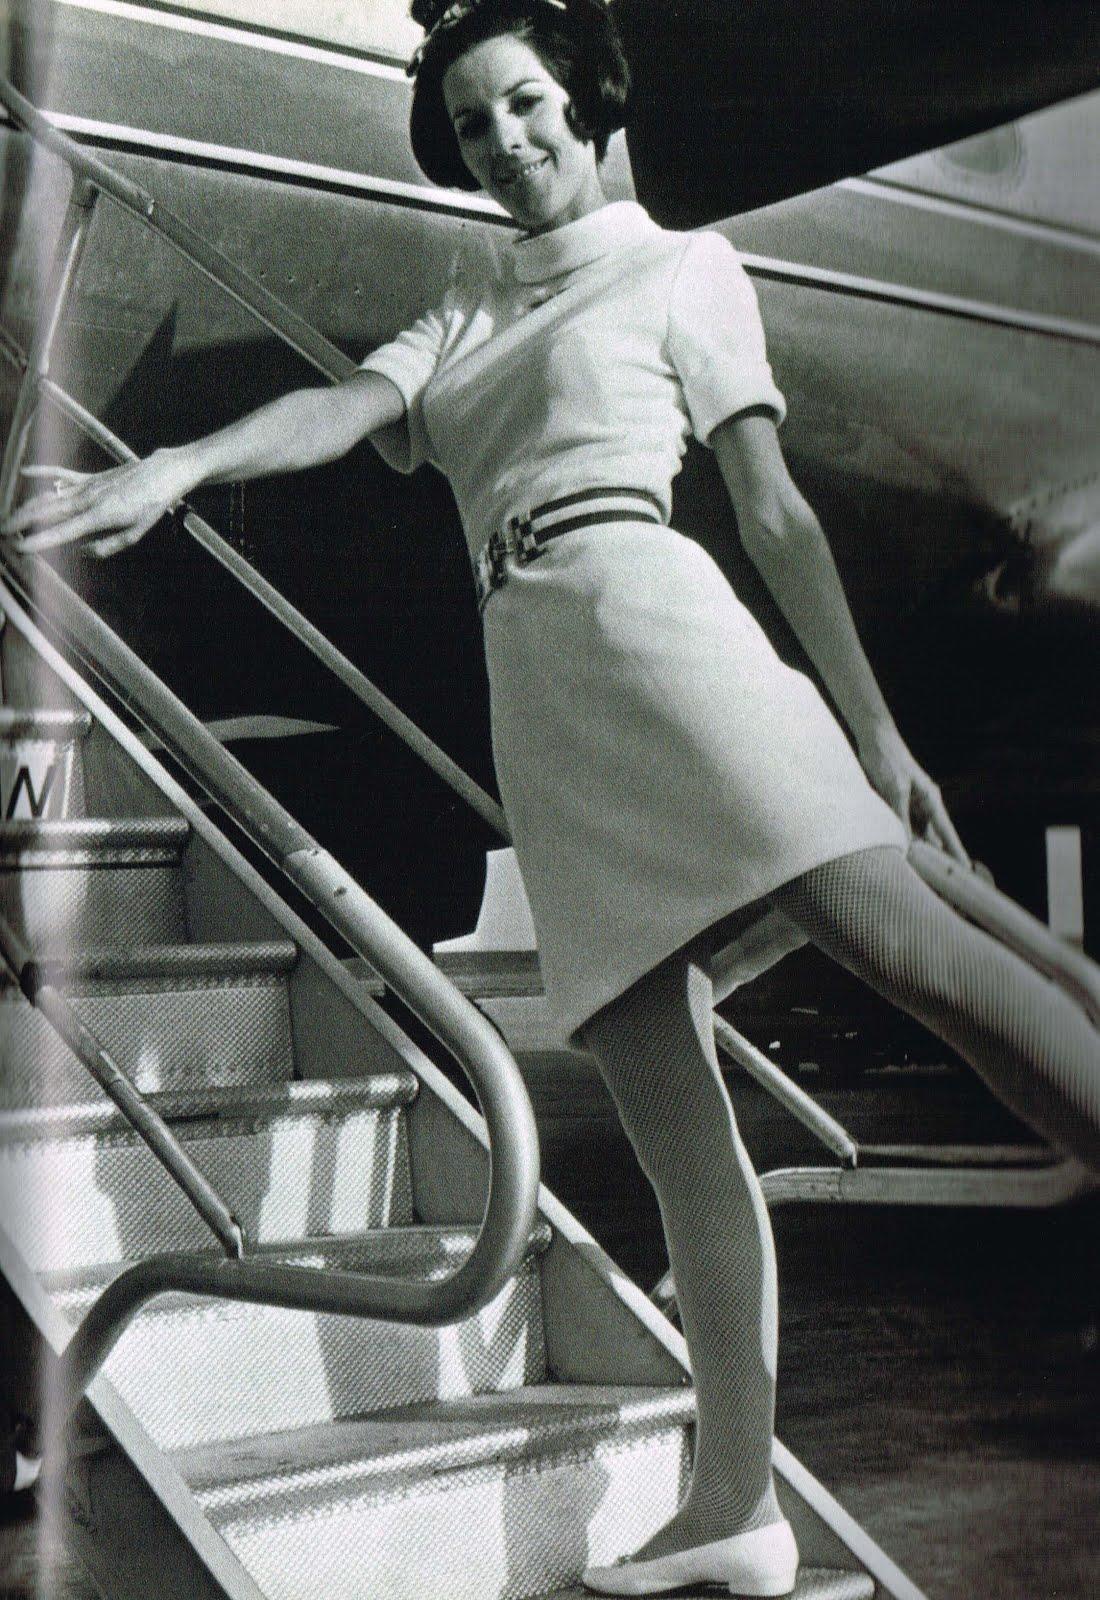 The Trad Stewardesses